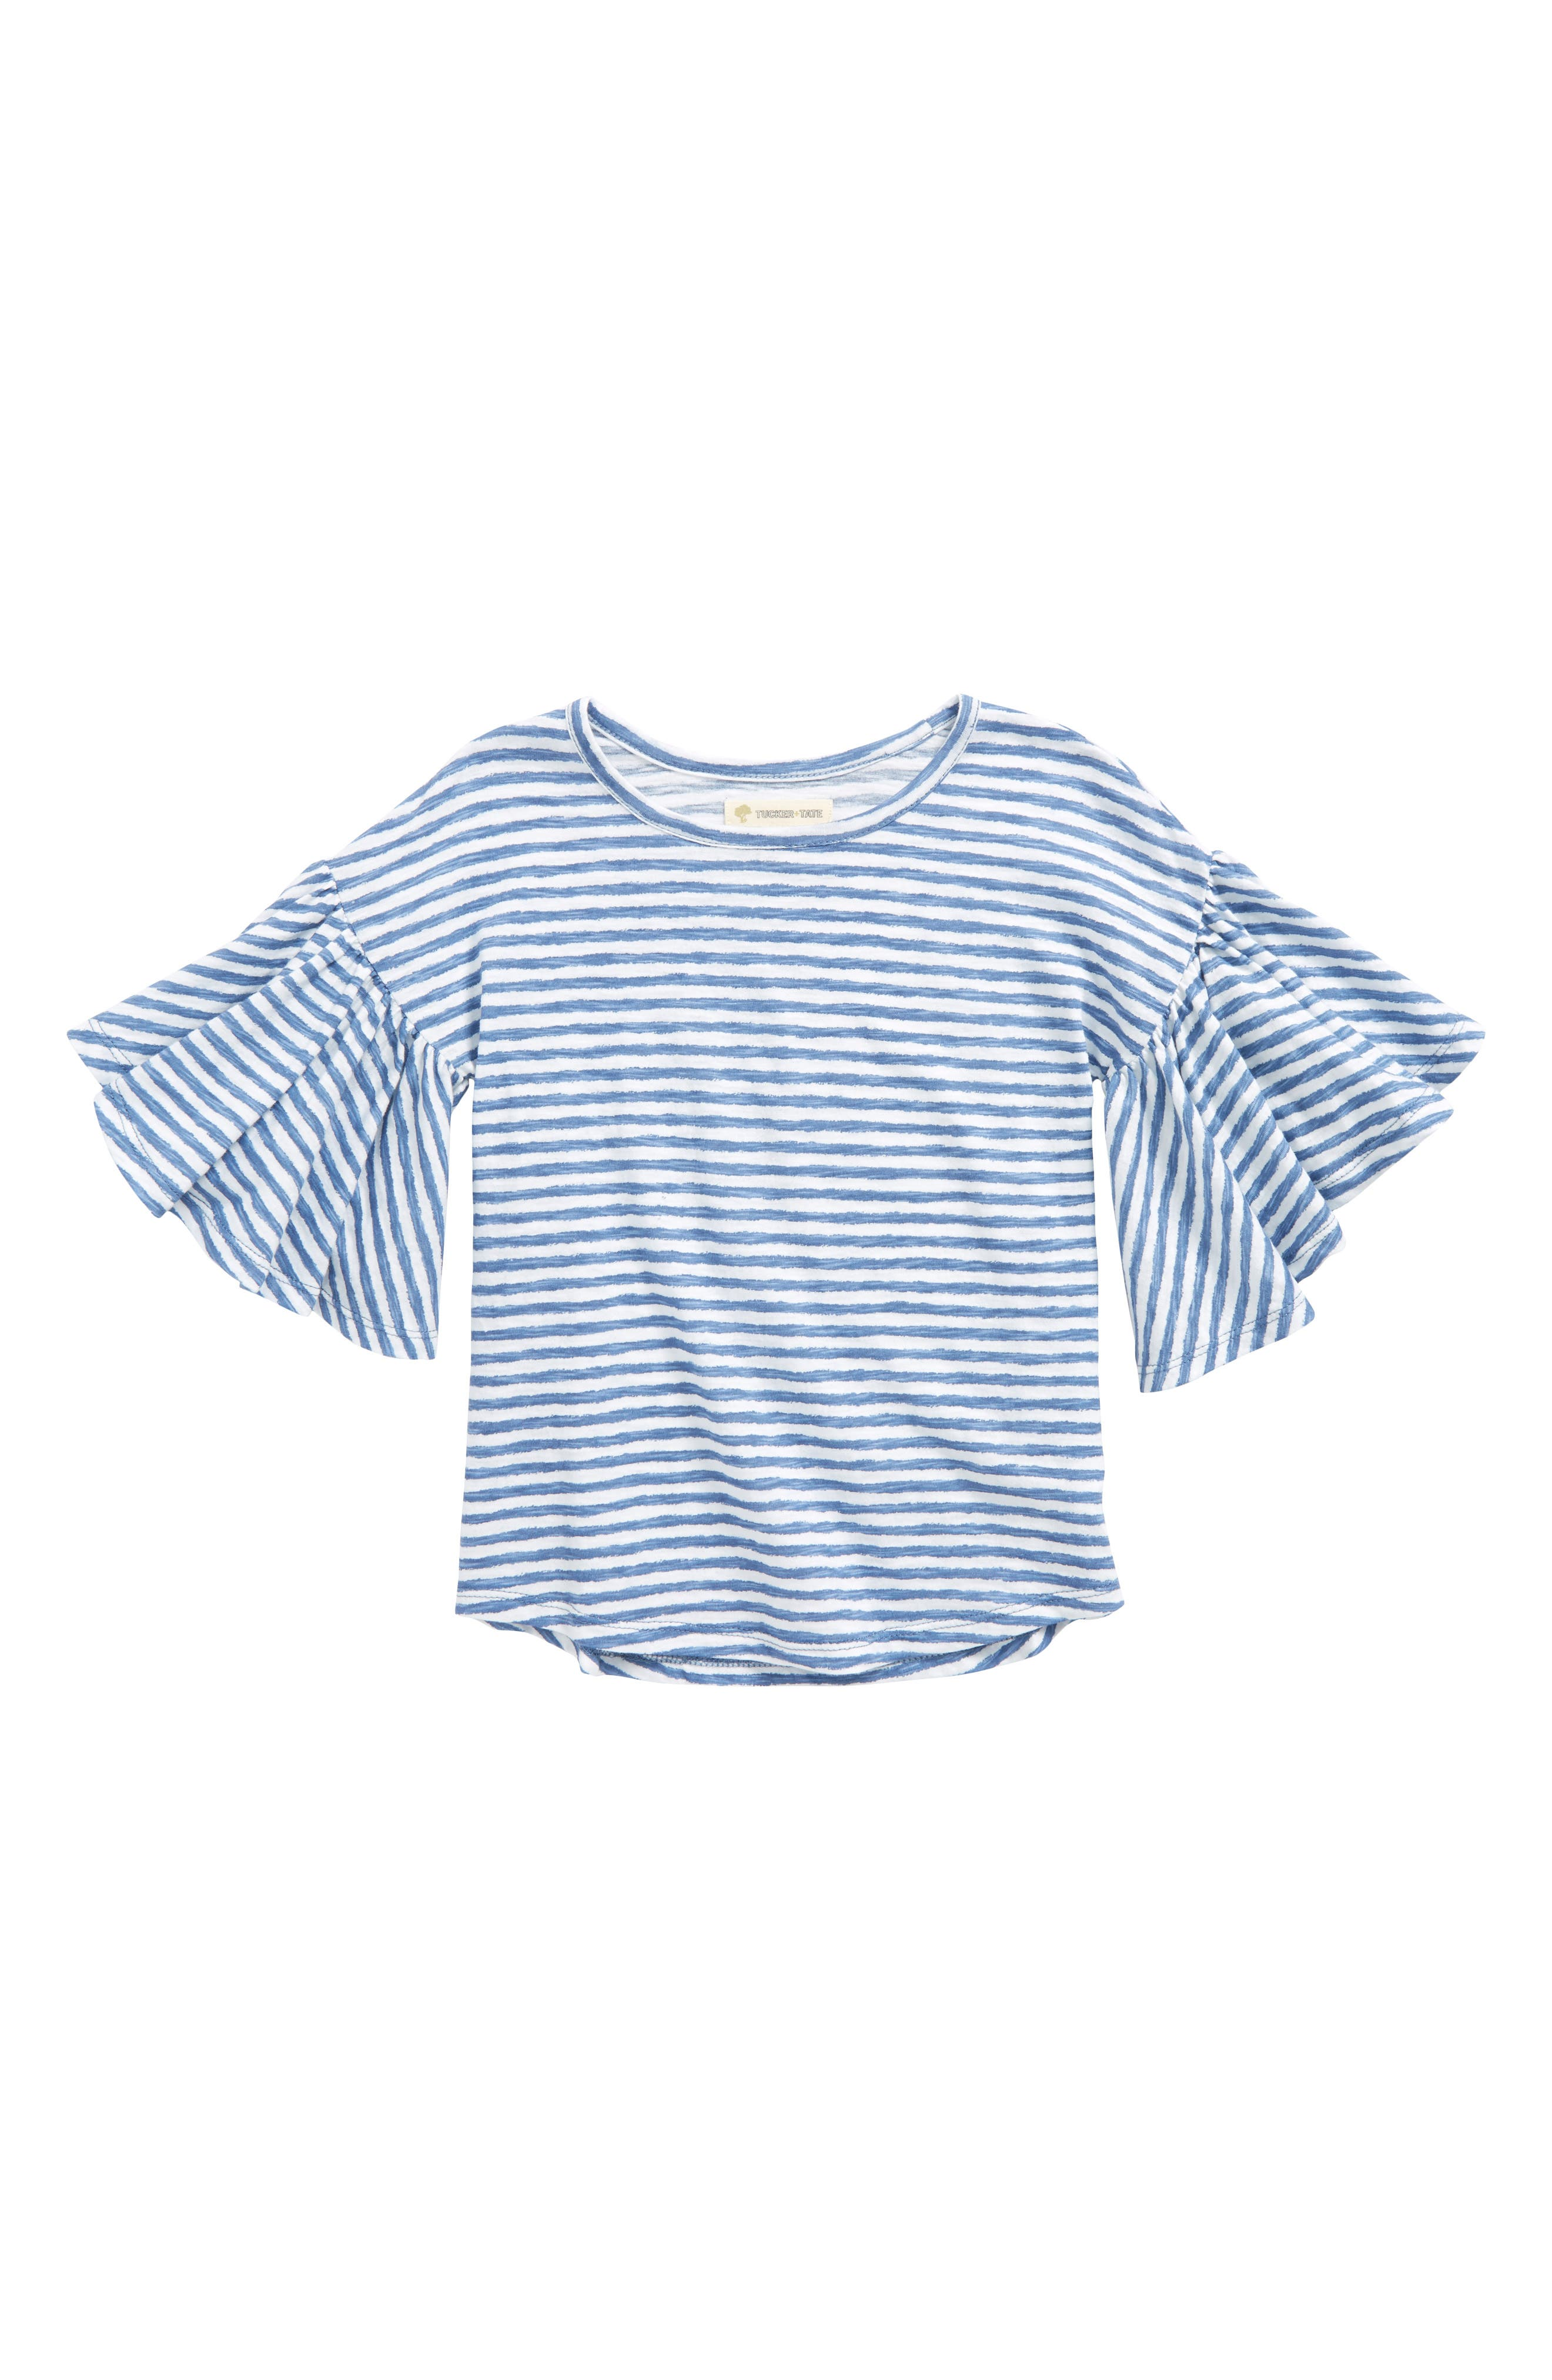 Ruffle Sleeve Top,                             Main thumbnail 1, color,                             White- Blue Stripe